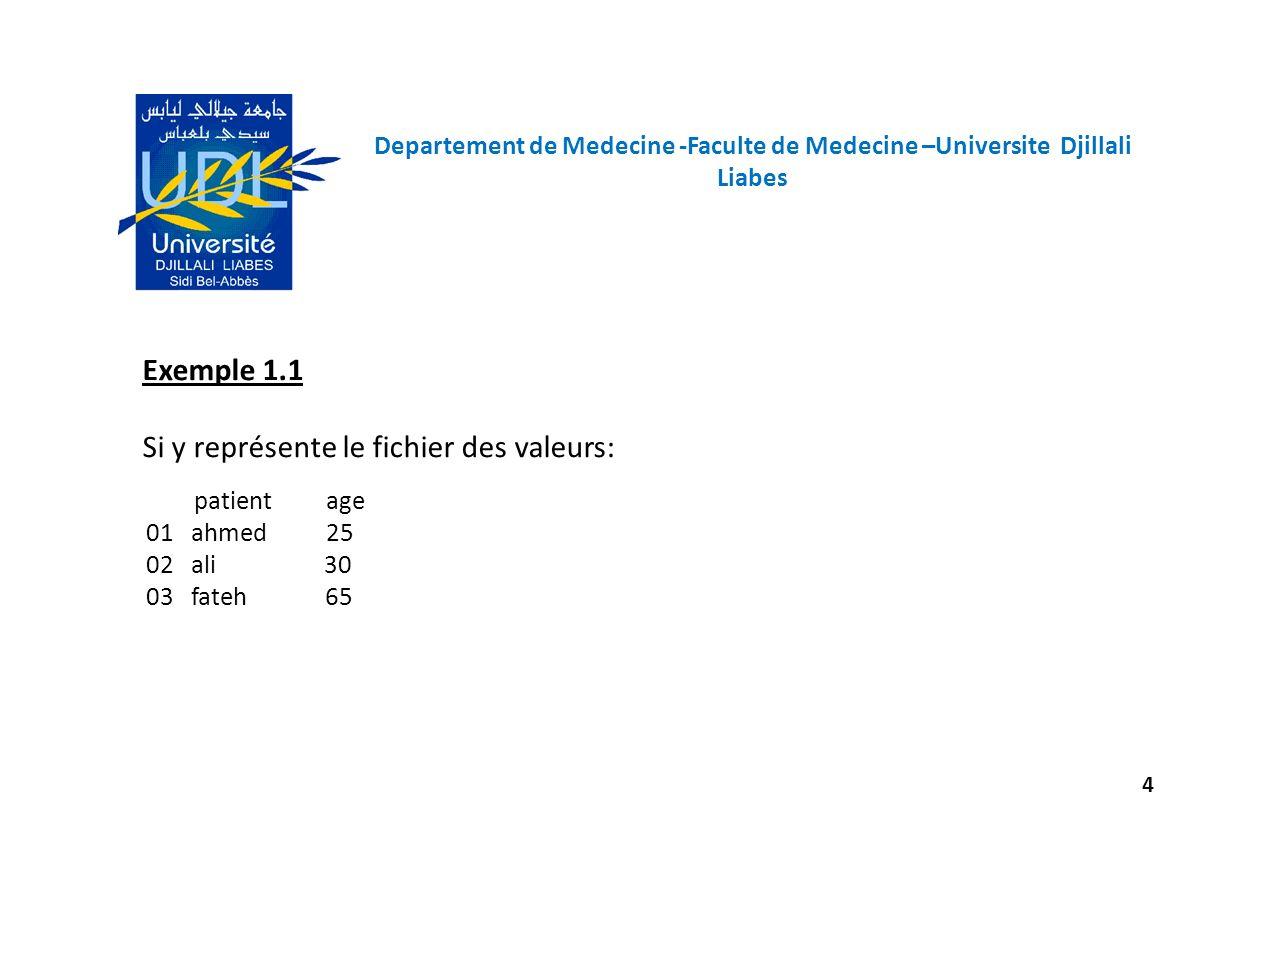 Departement de Medecine -Faculte de Medecine –Universite Djillali Liabes 5 EN R y=scan(file= c:/ff1.data , what= )